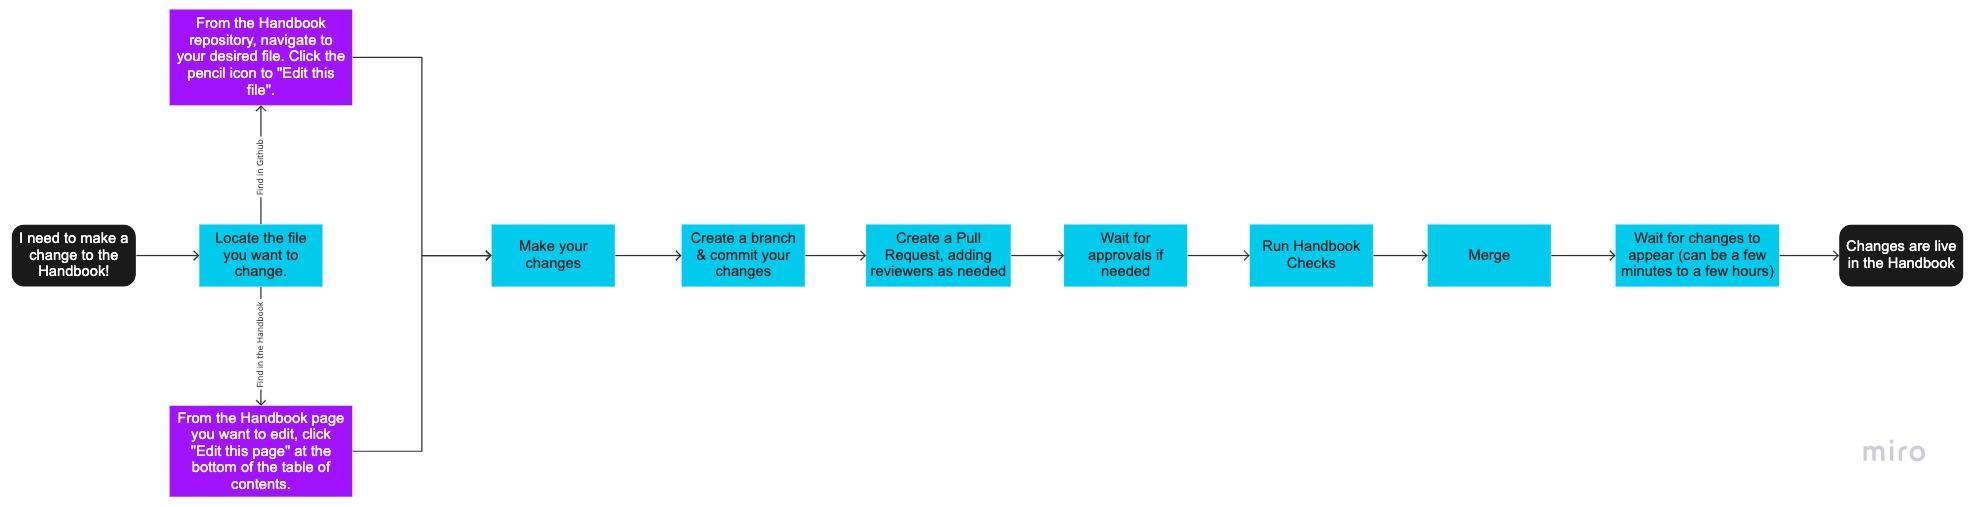 Editing the Handbook Flow